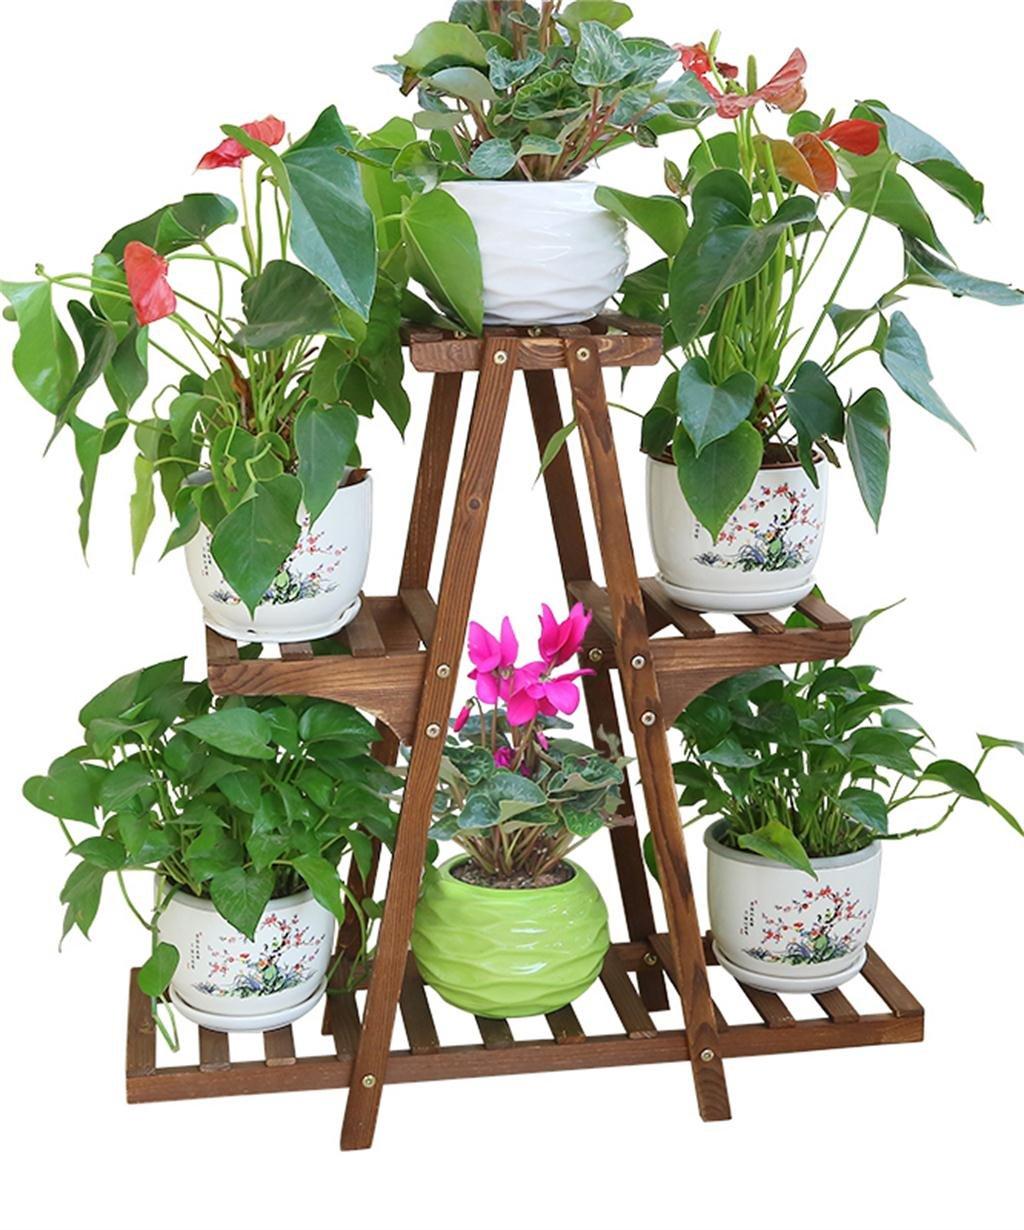 LB huajia ZHANWEI Massivholz Blumen Racks Boden Blumentöpfe Regal Balkon Wohnzimmer Sukkulenten Pflanze Stand